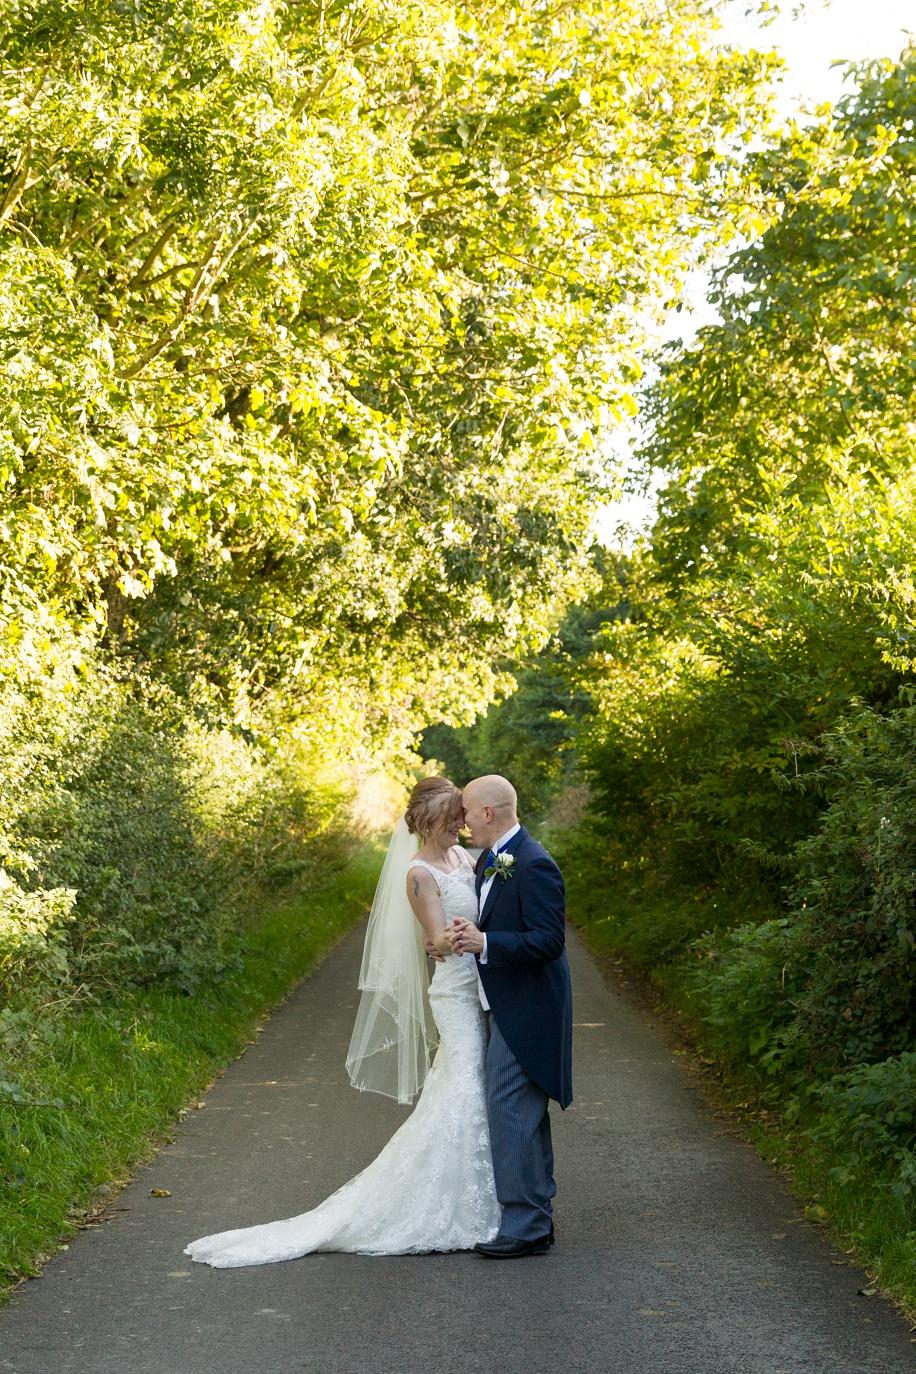 Tithe Barn wedding photography of the bride and groom